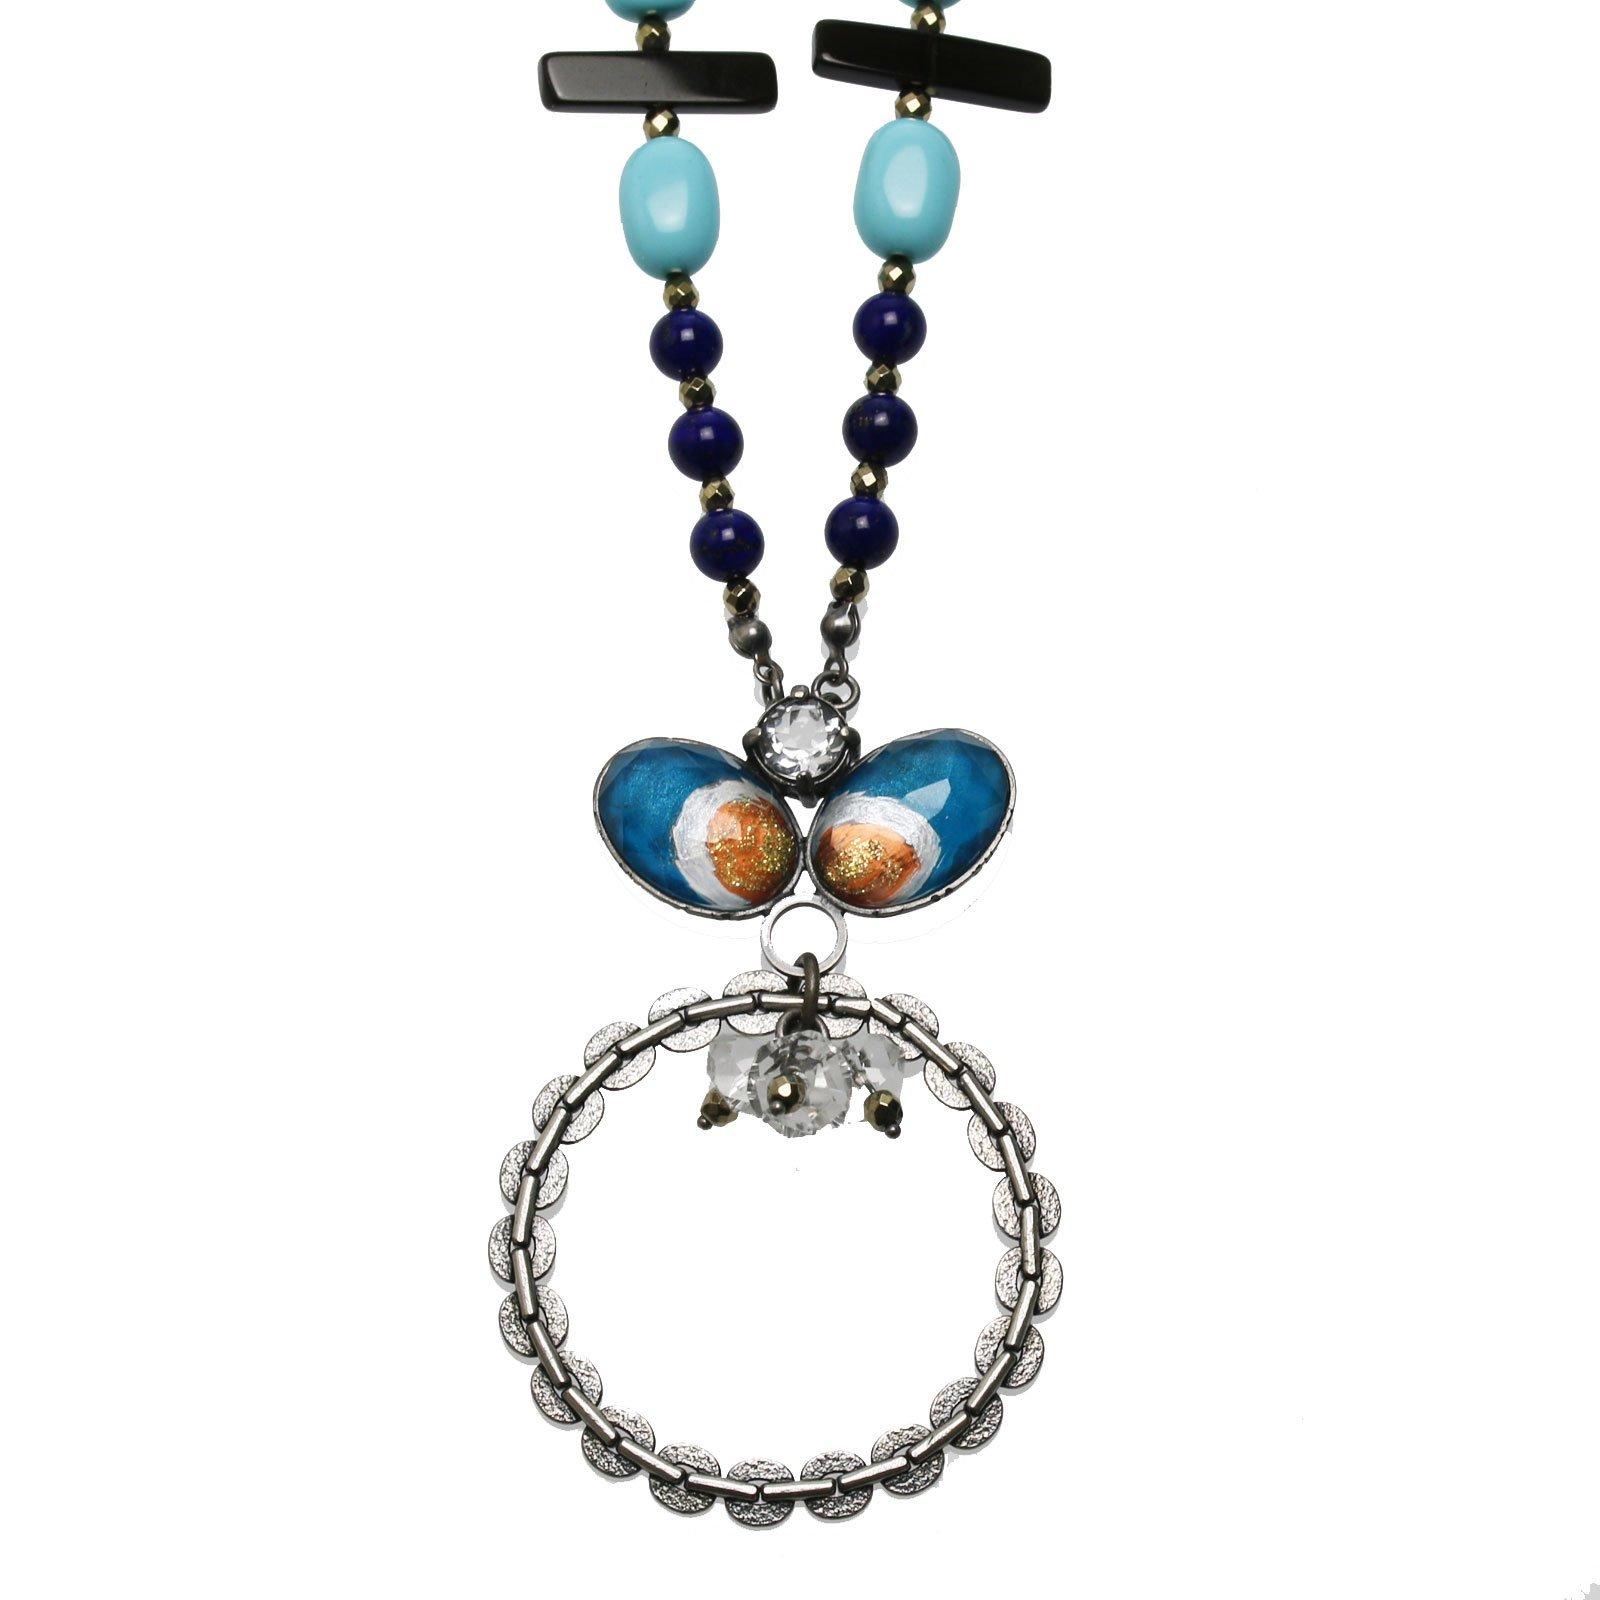 Tamarusan Glasses Holder Tibet Agate Onyx Hematite(Magnetic Containing) Lapis Lazuri Quartz Handmade Eyeglass Holder